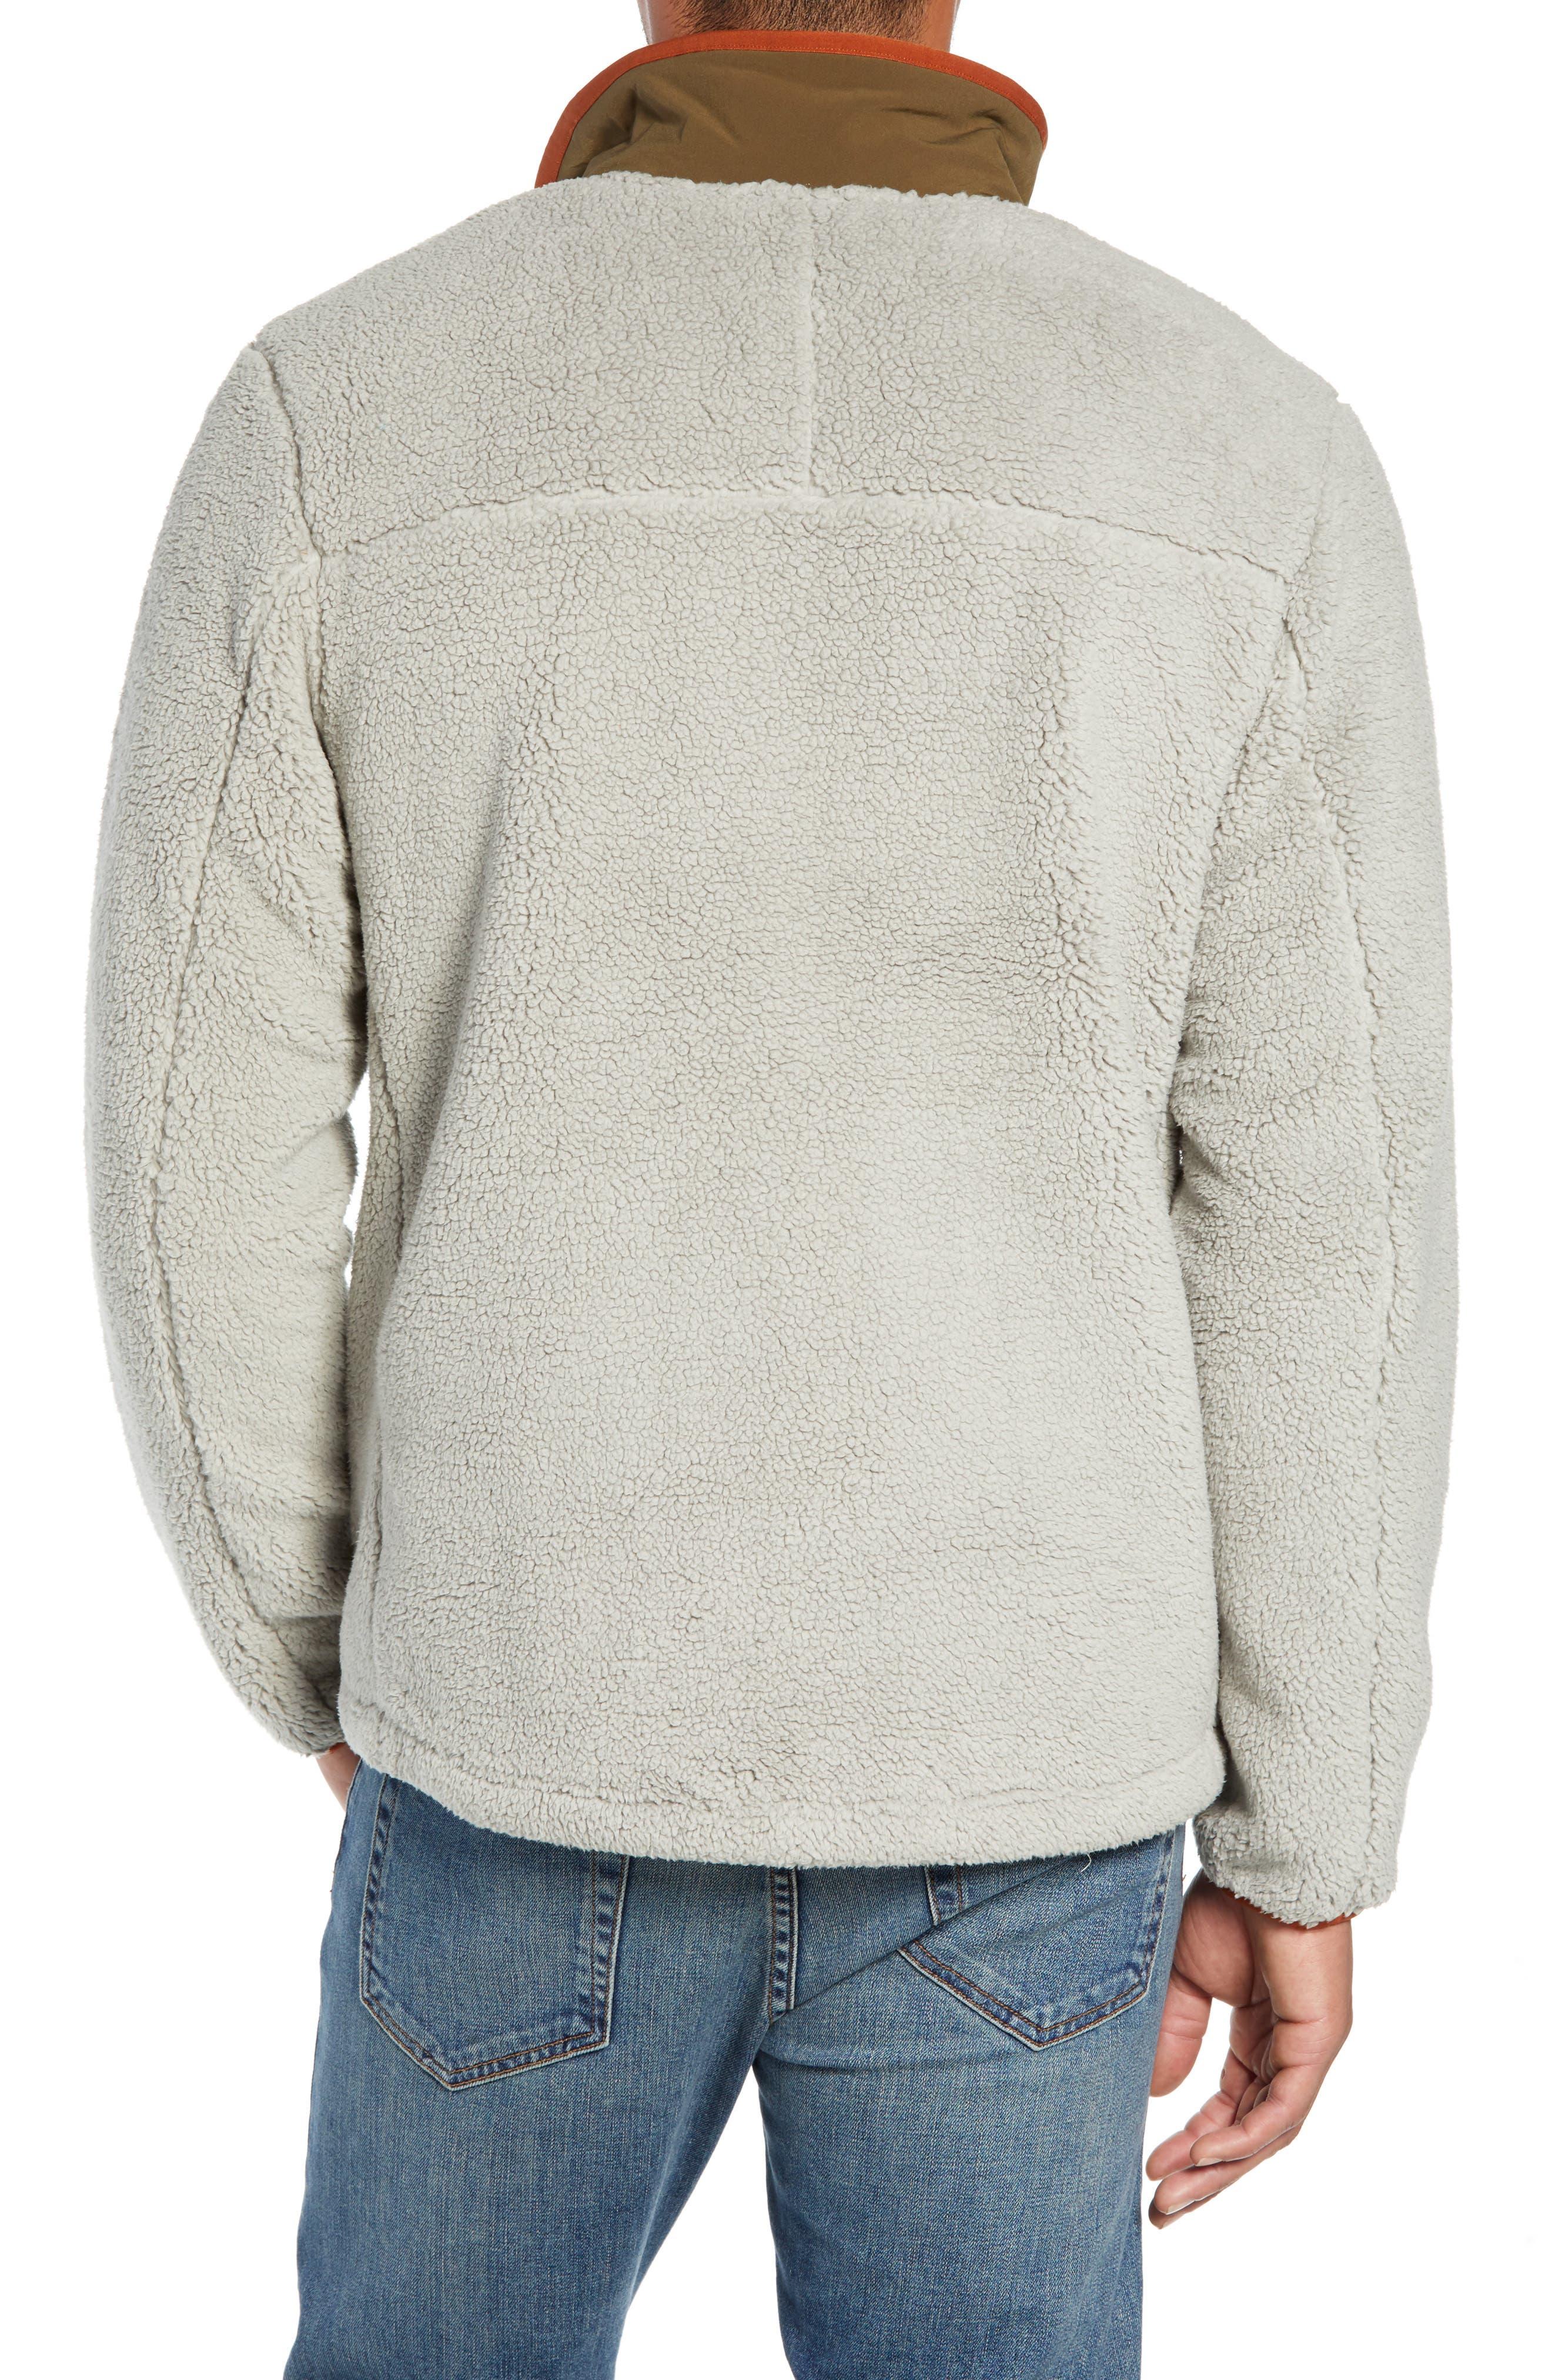 Campshire Zip Fleece Jacket,                             Alternate thumbnail 18, color,